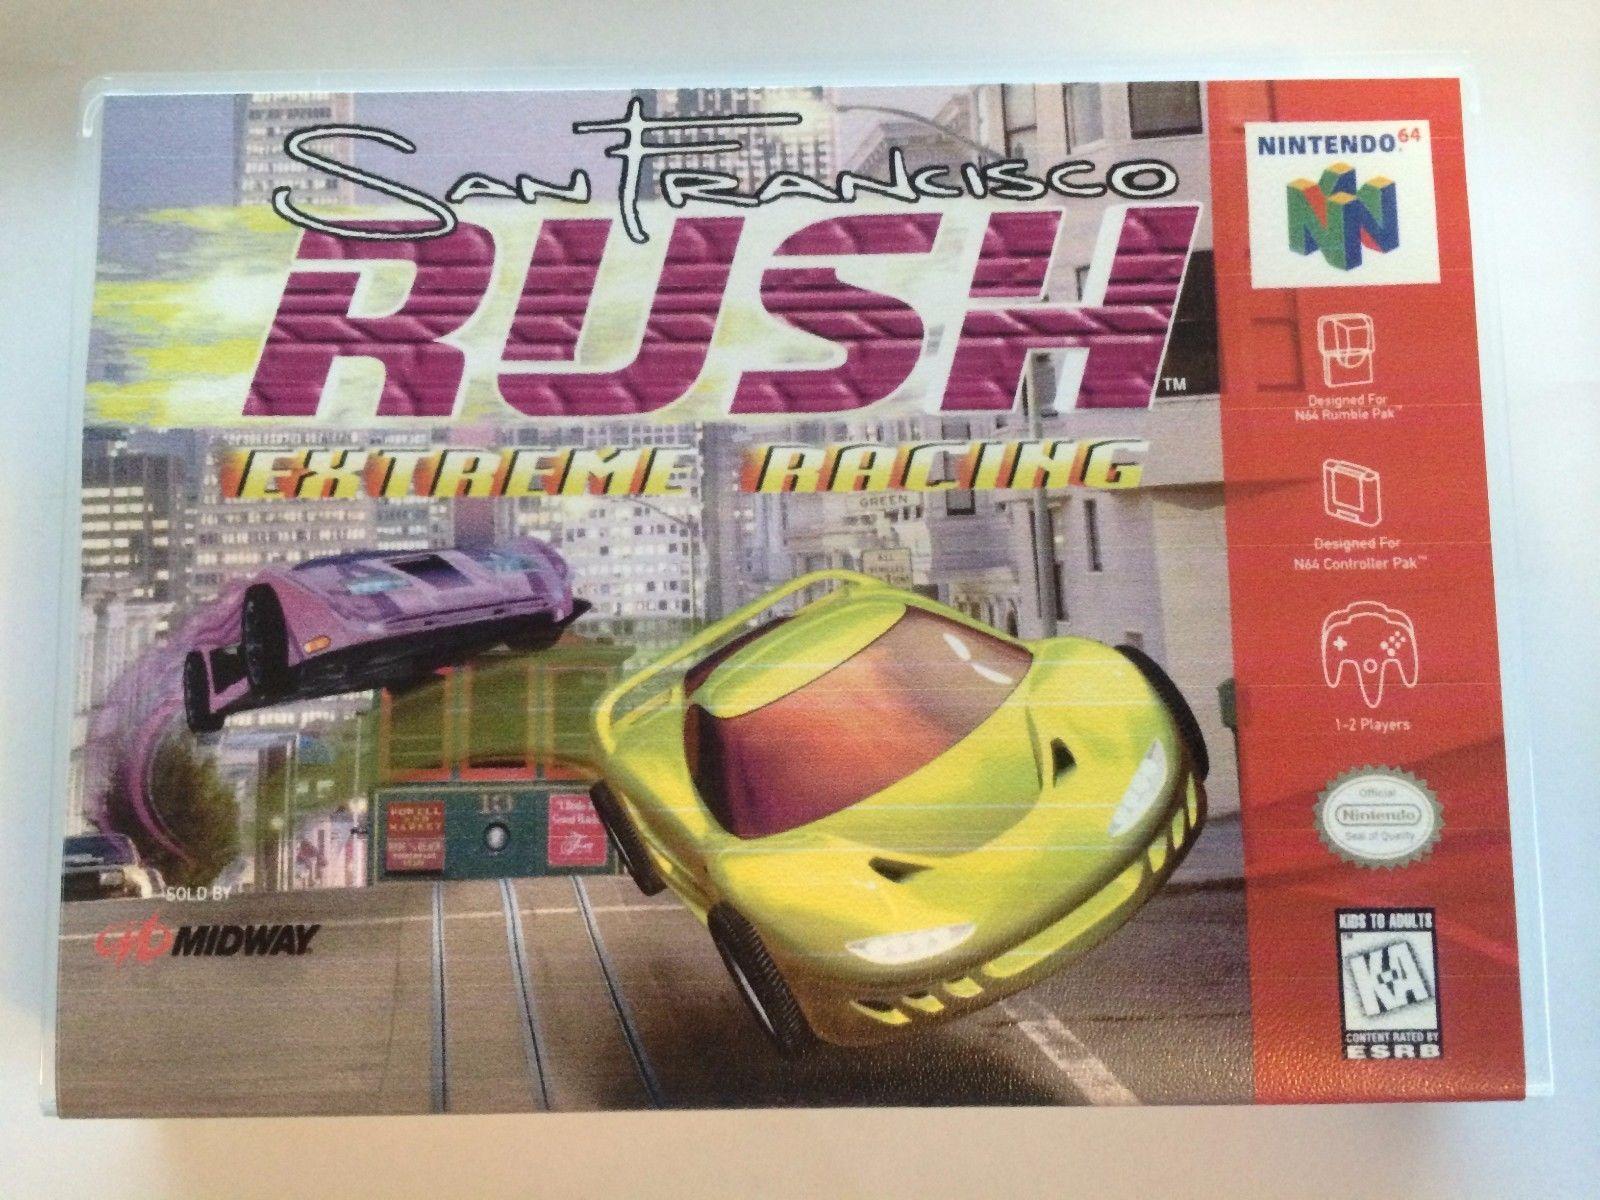 San Francisco Rush Extreme Racing - Nintendo 64 - Replacement Case - No Game